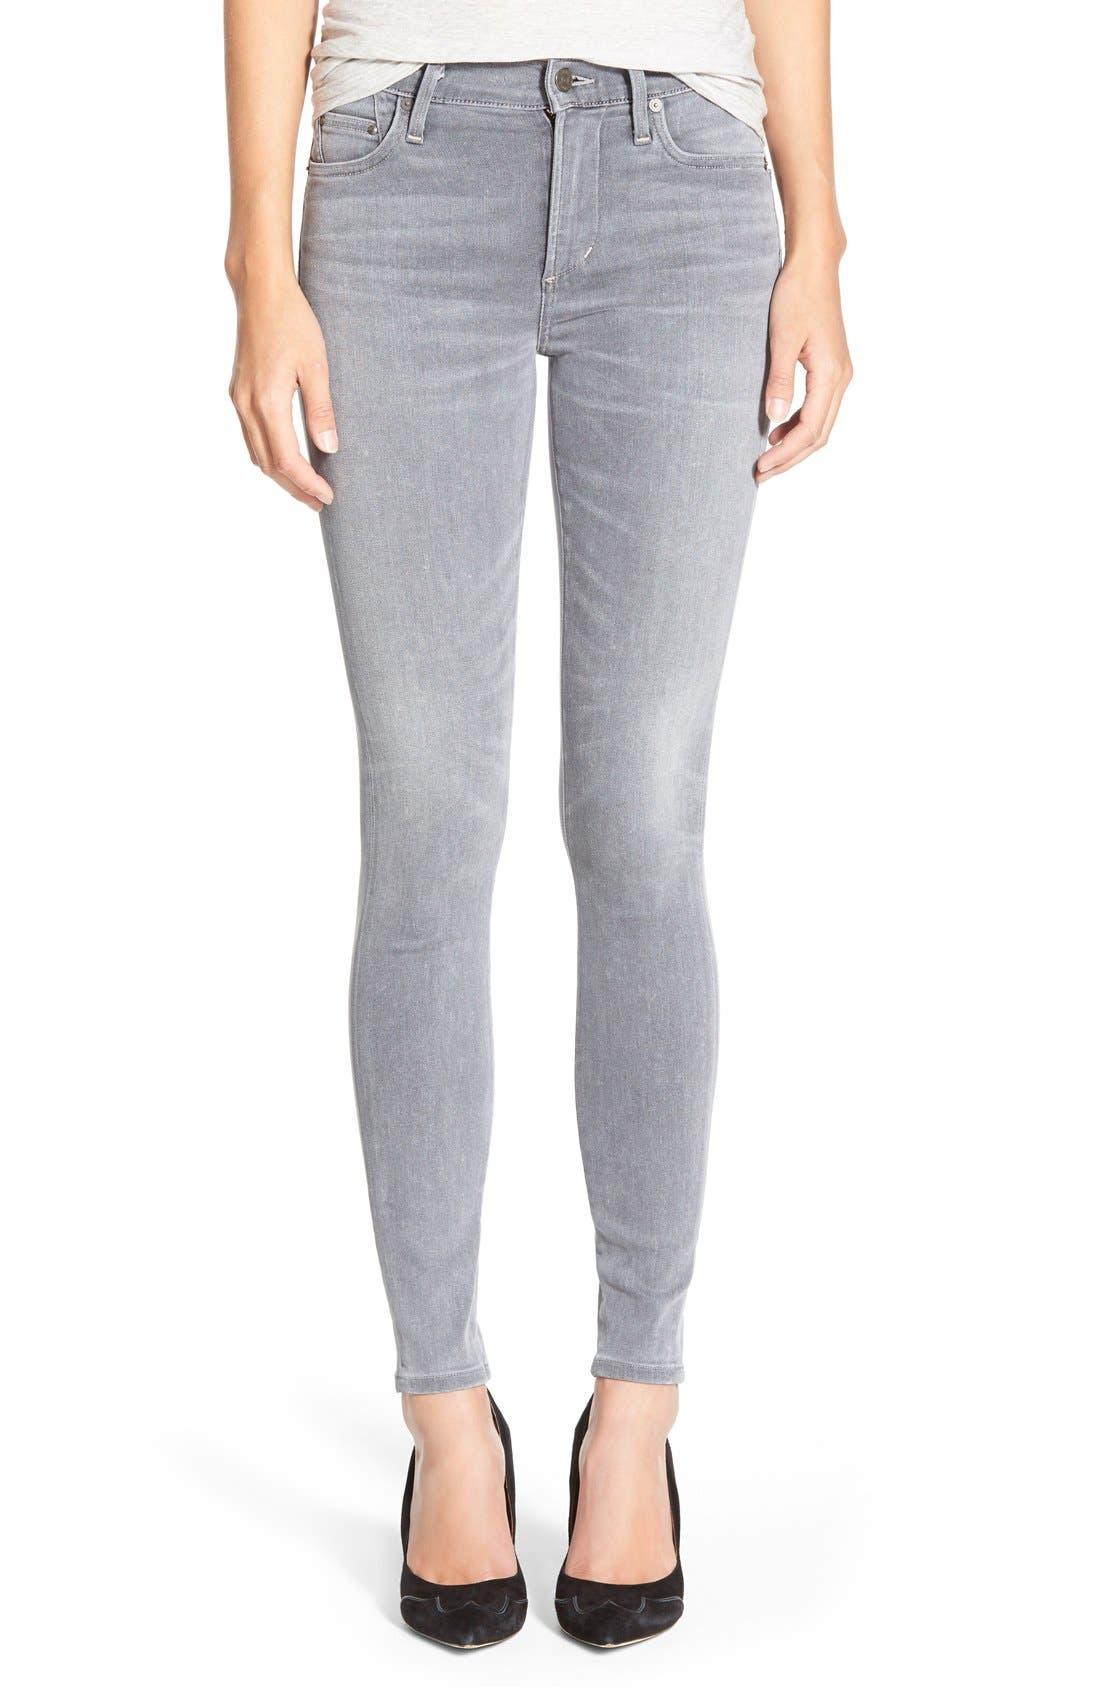 'Sculpt - Rocket' High Rise Skinny Jeans, Main, color, 078